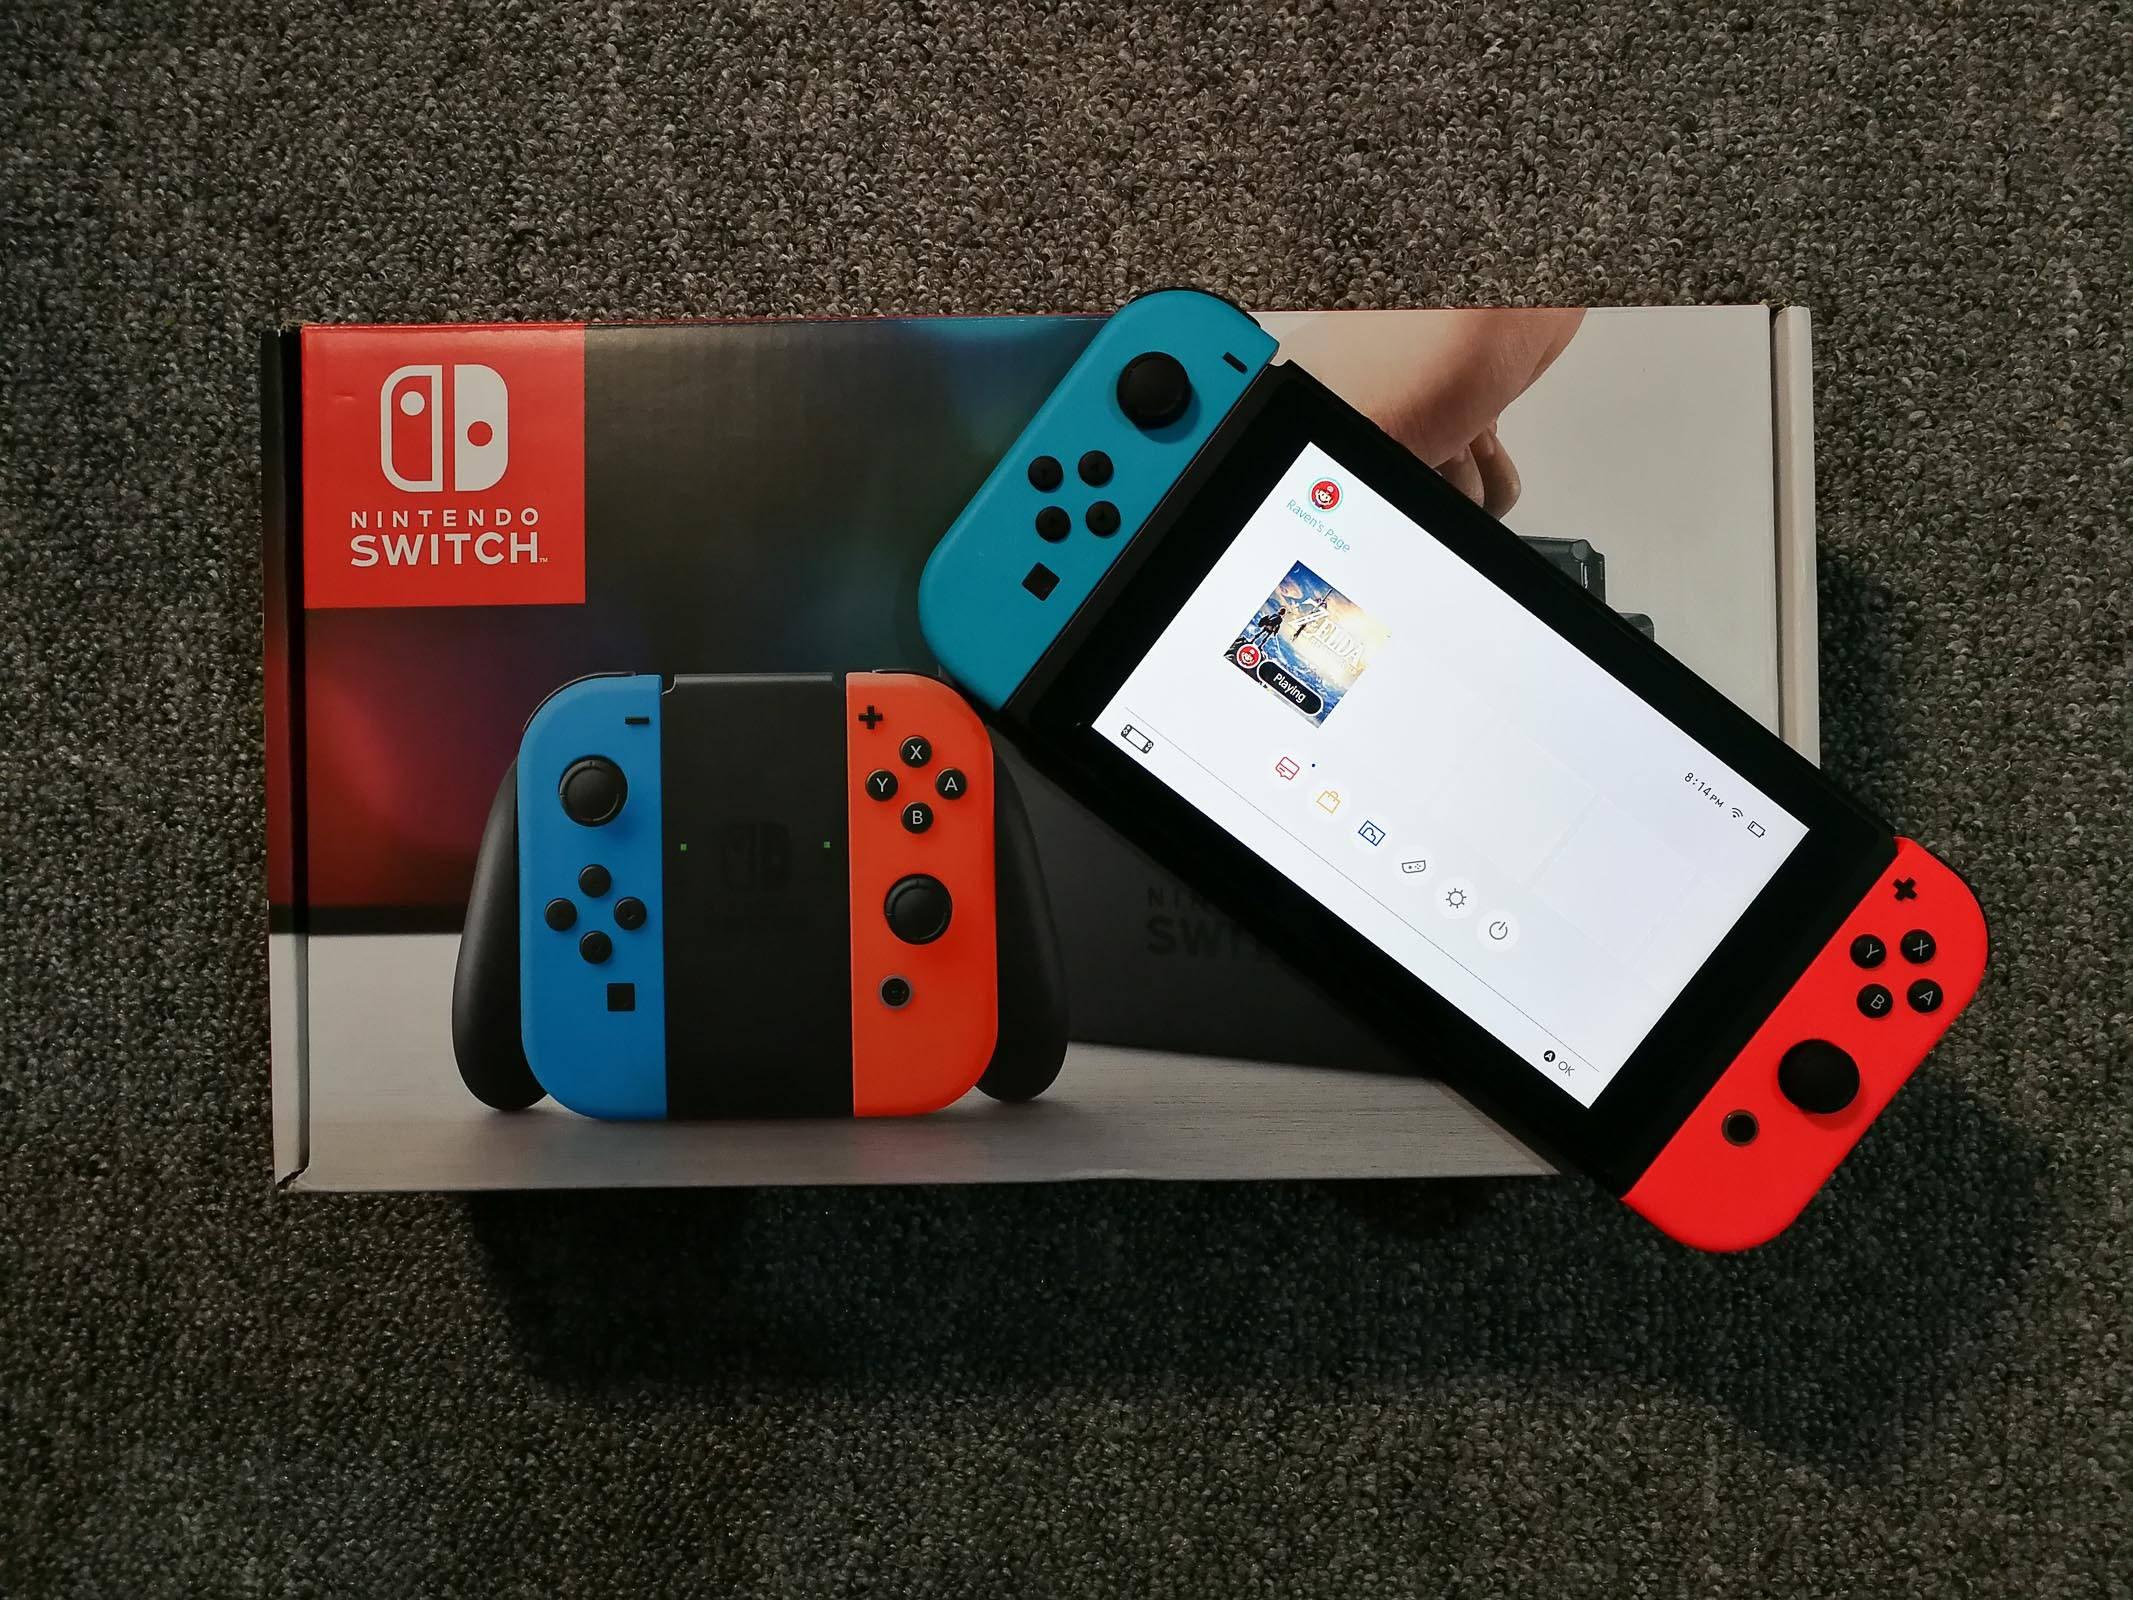 Nintendo-Switch-Photo-By-Hao-Ying 32